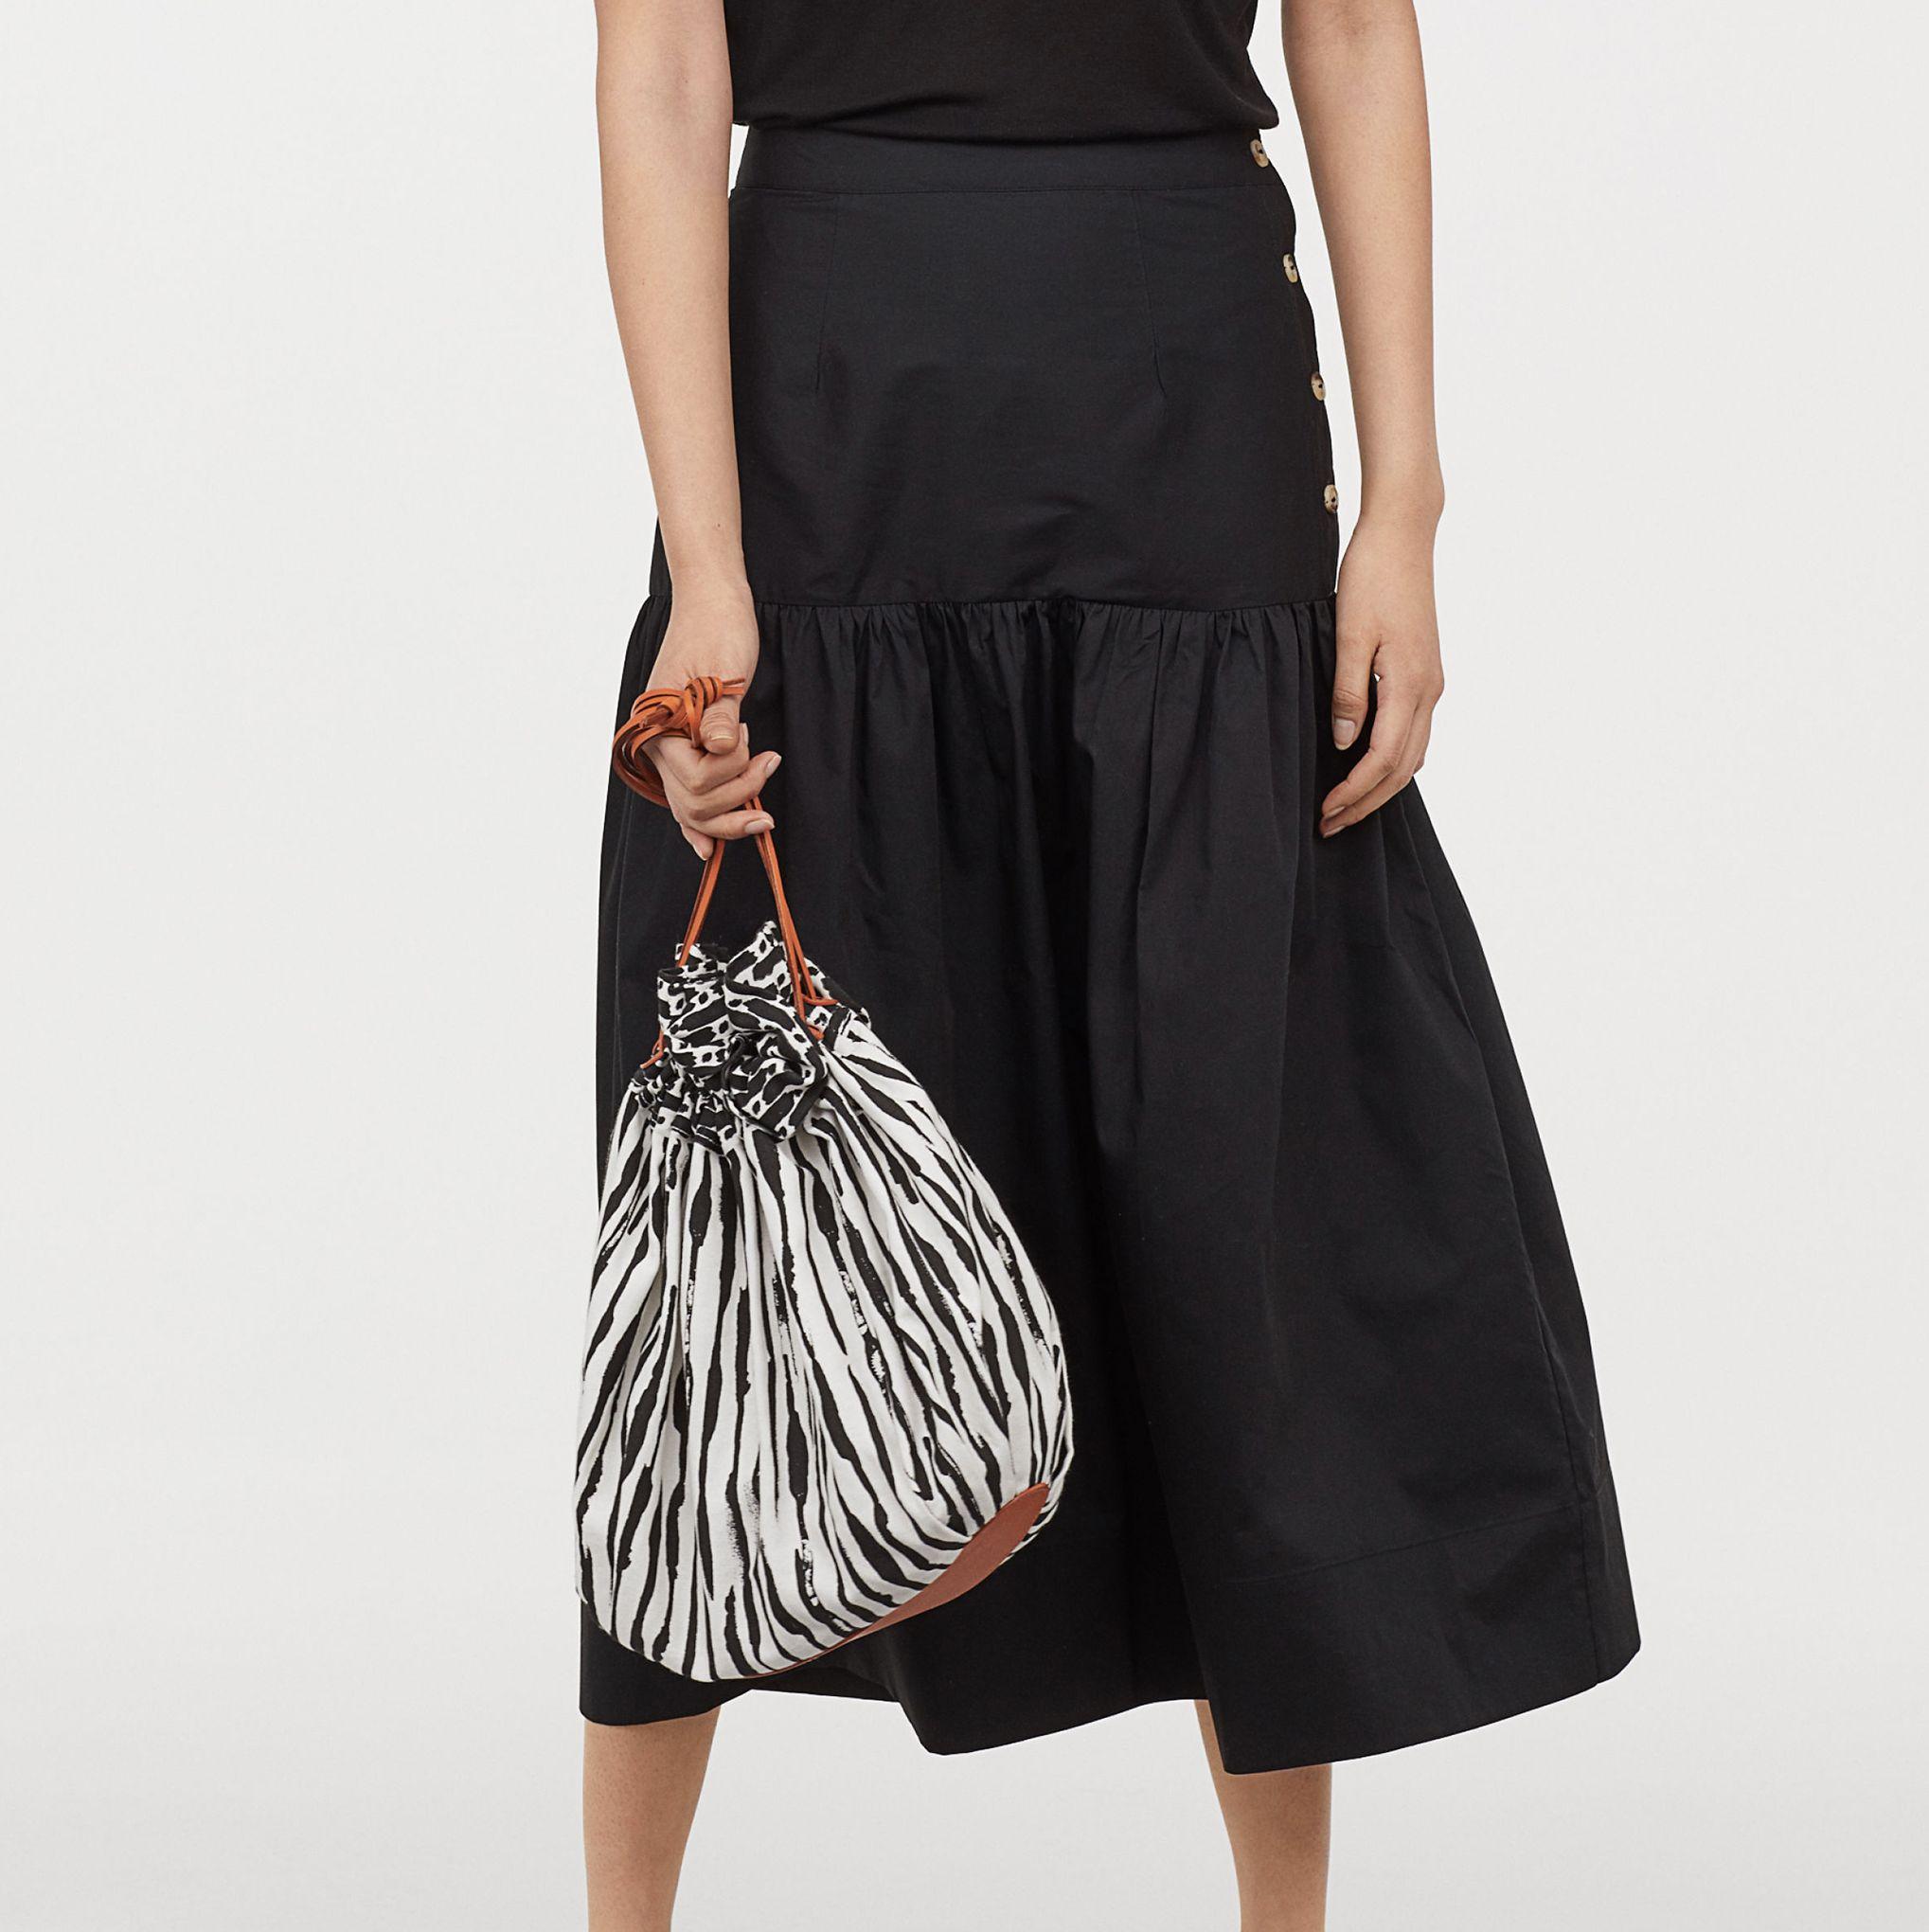 holiday capsule wardrobe: skirt